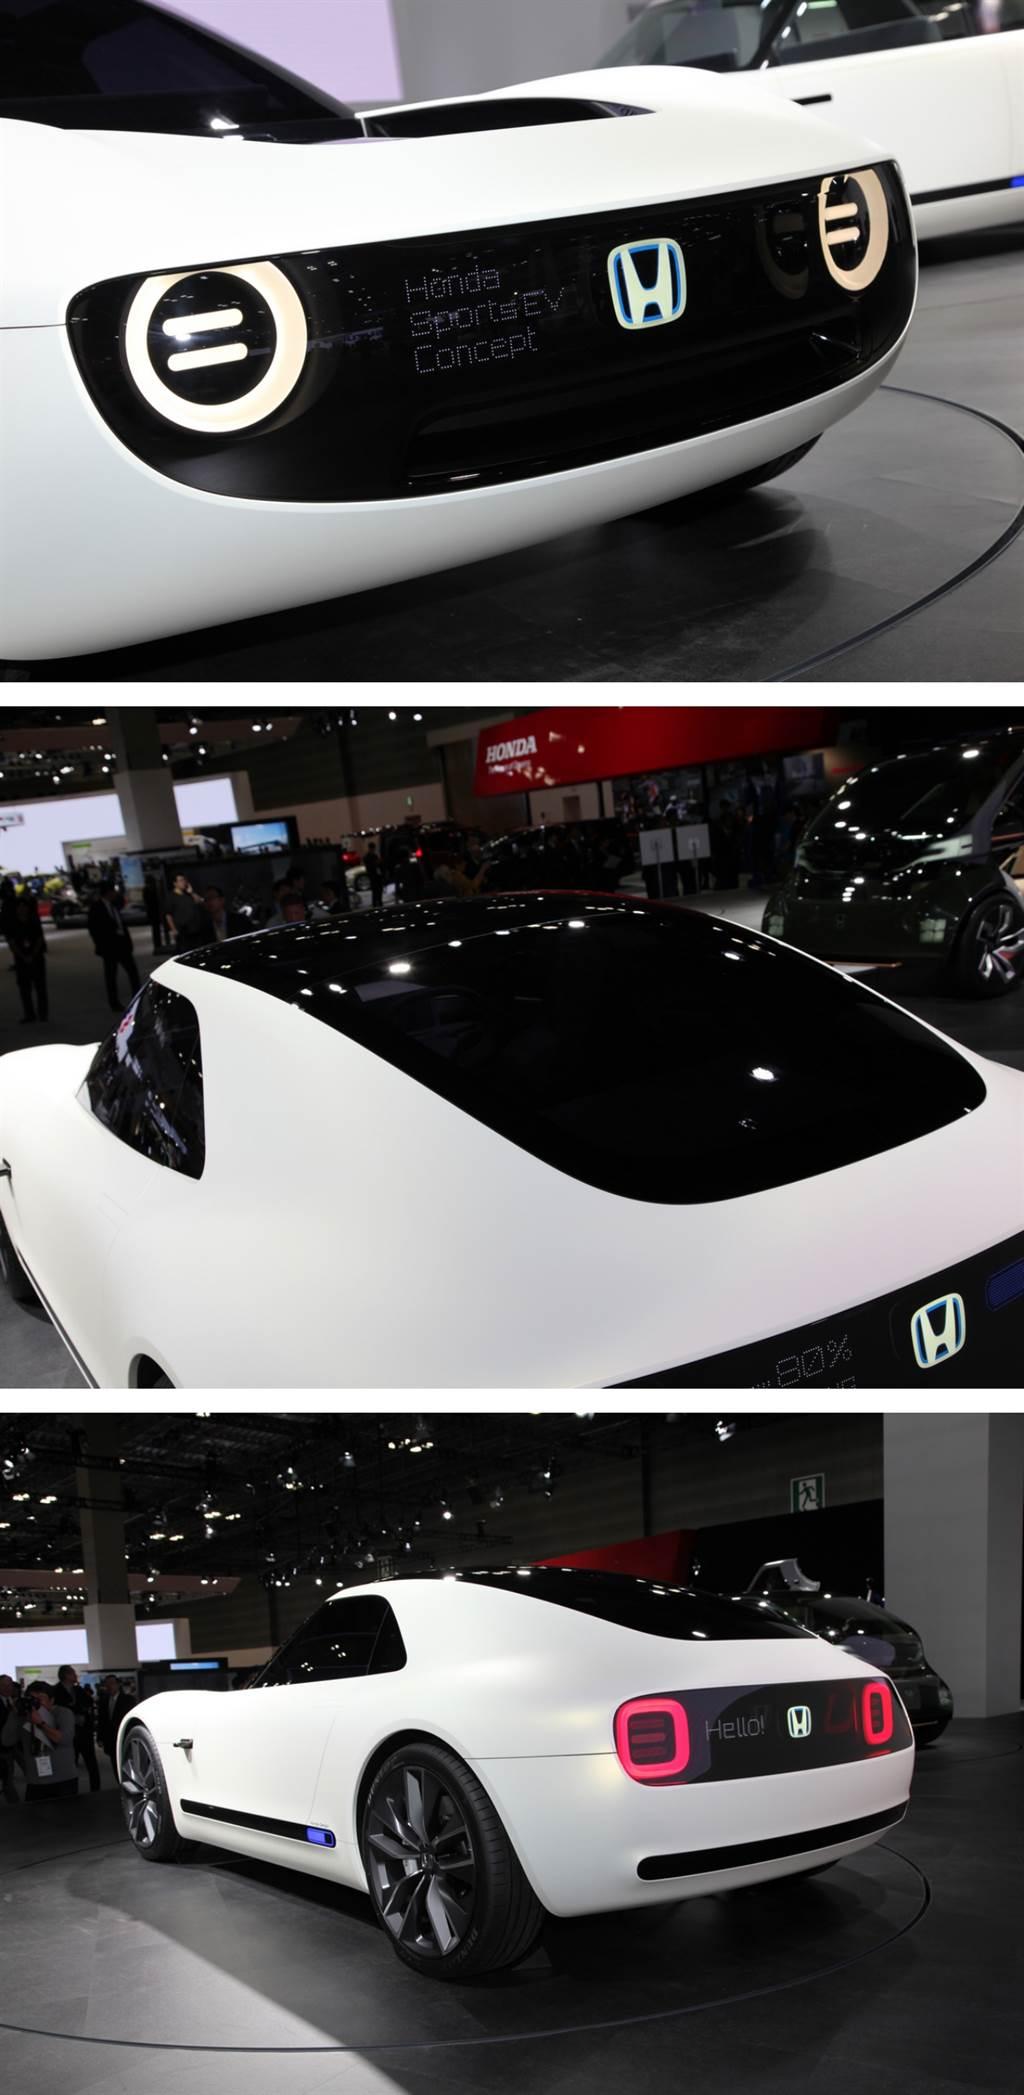 S600/S800 Coupe 現代版化身將至?Honda Sports EV Concept 量產版積極測試中